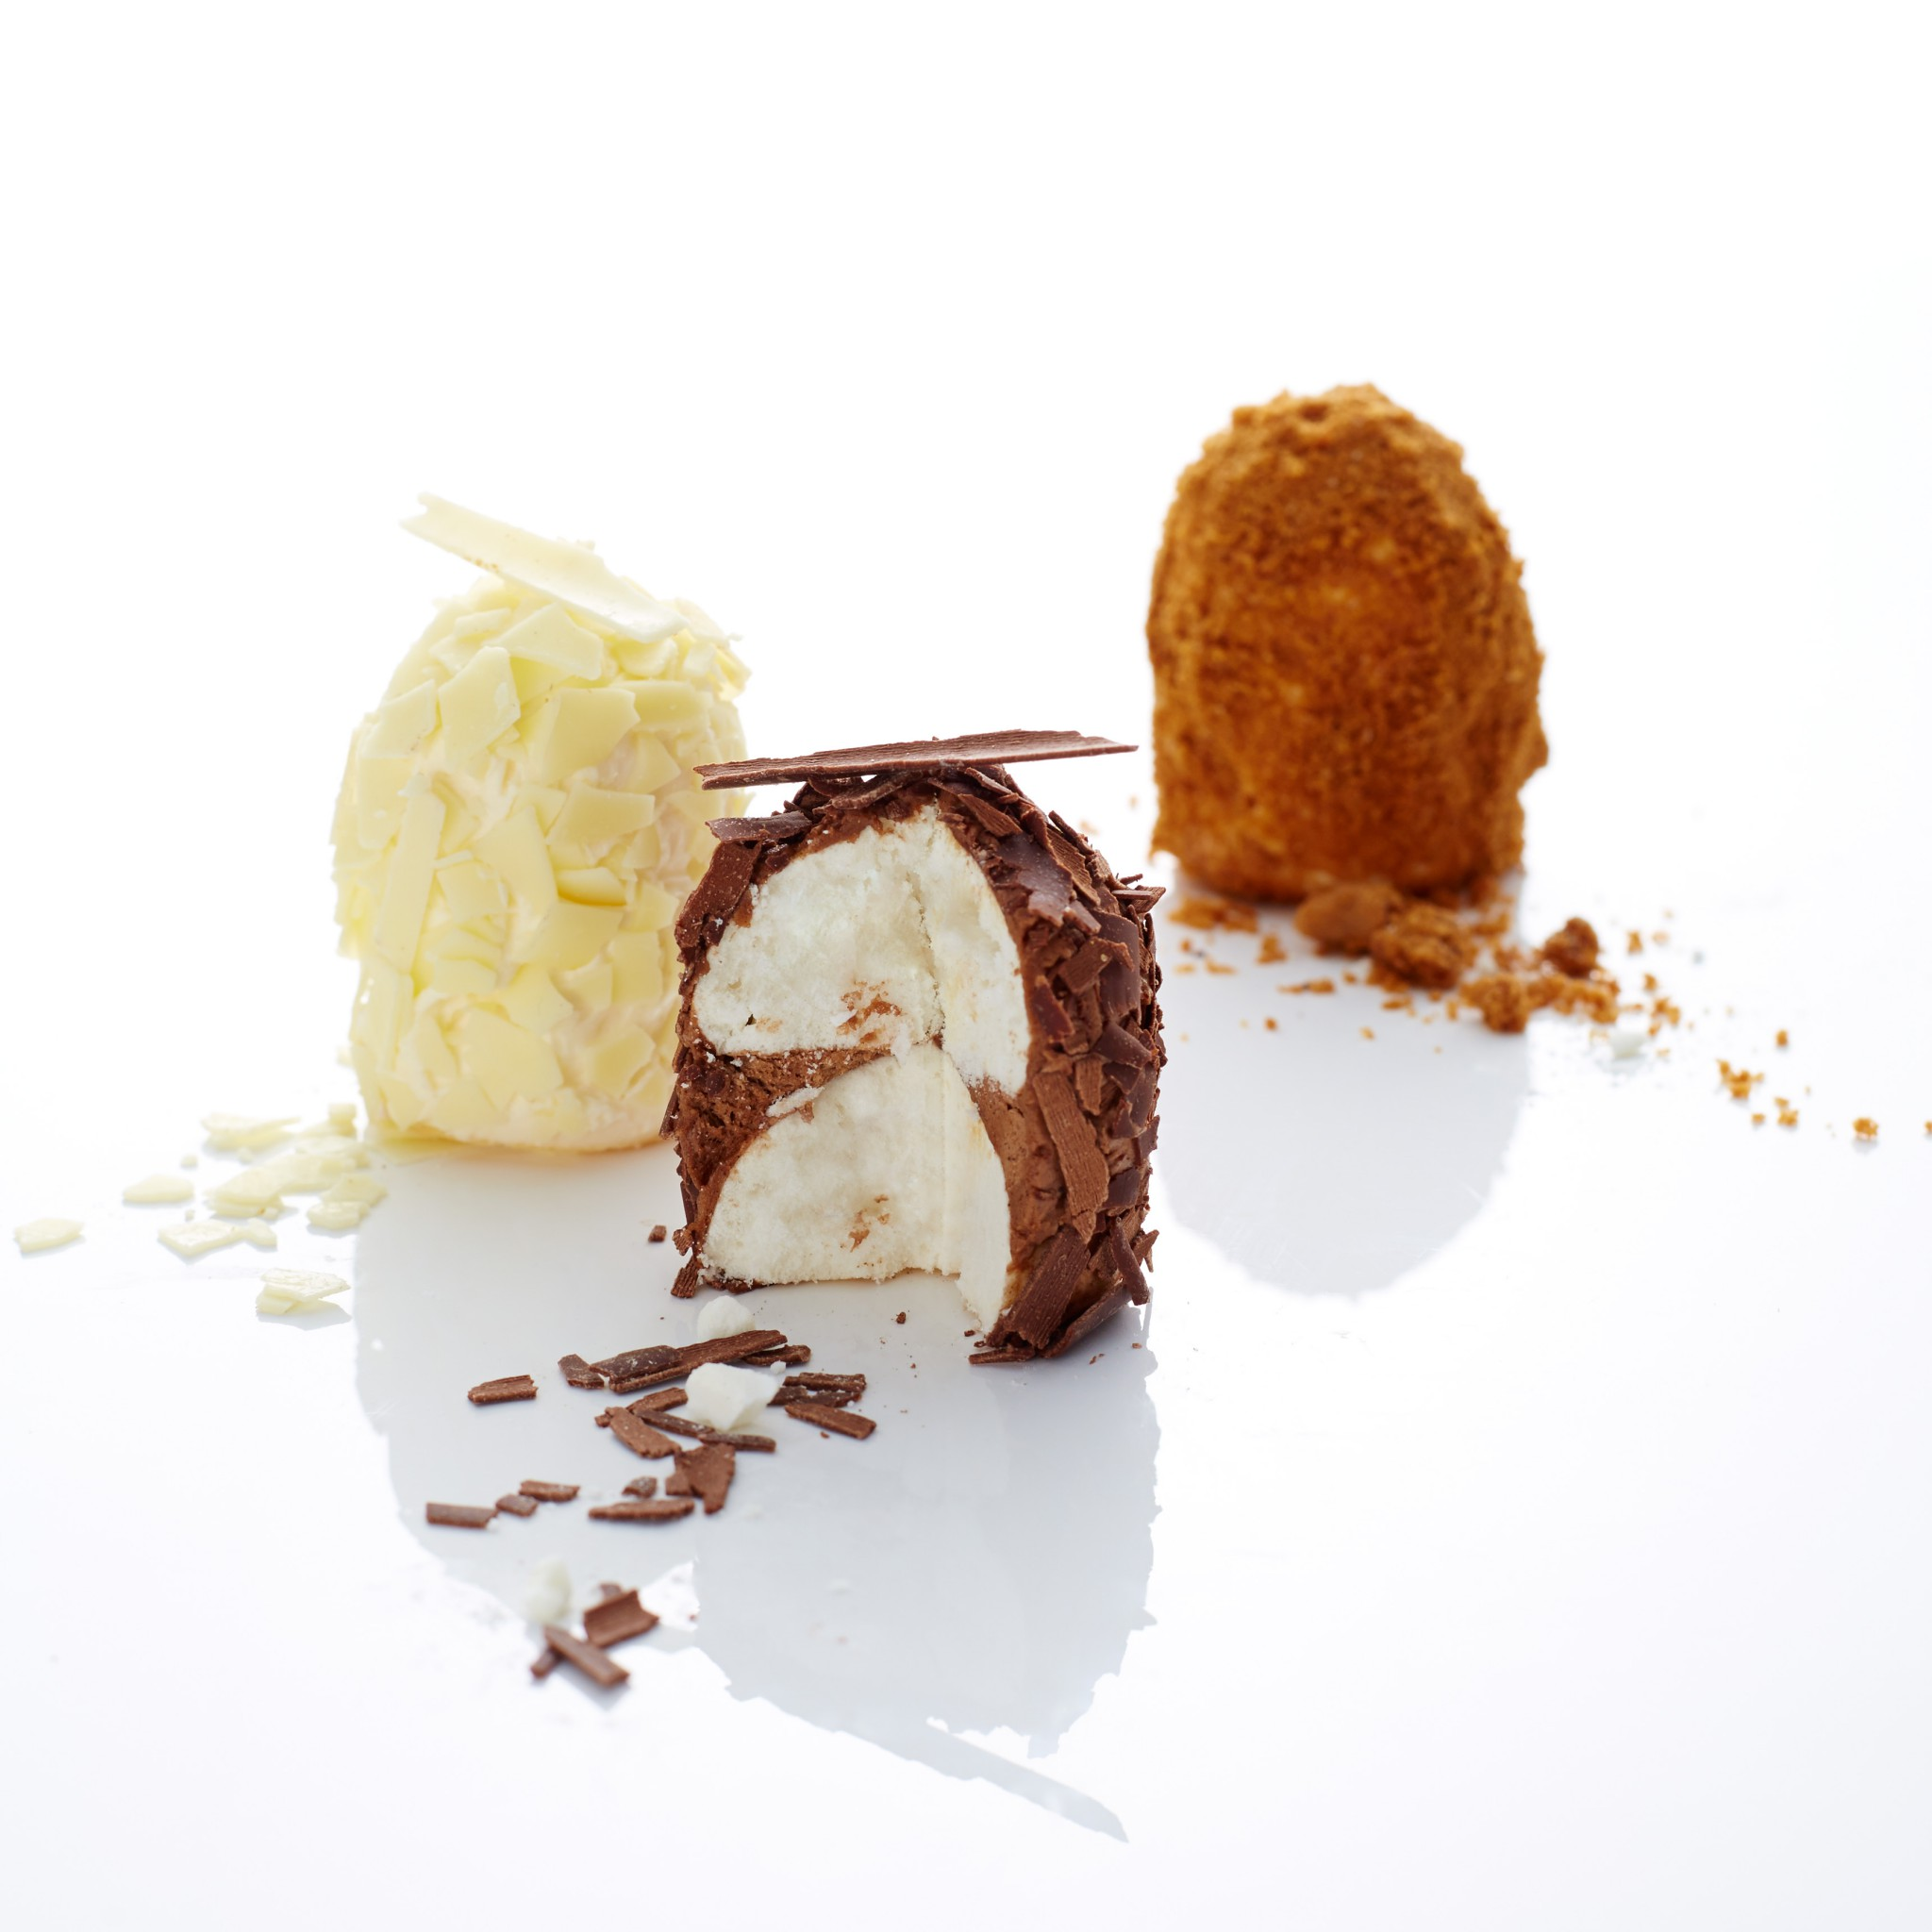 Mini merveilleux chocolat, chocolat blanc ou spéculoos